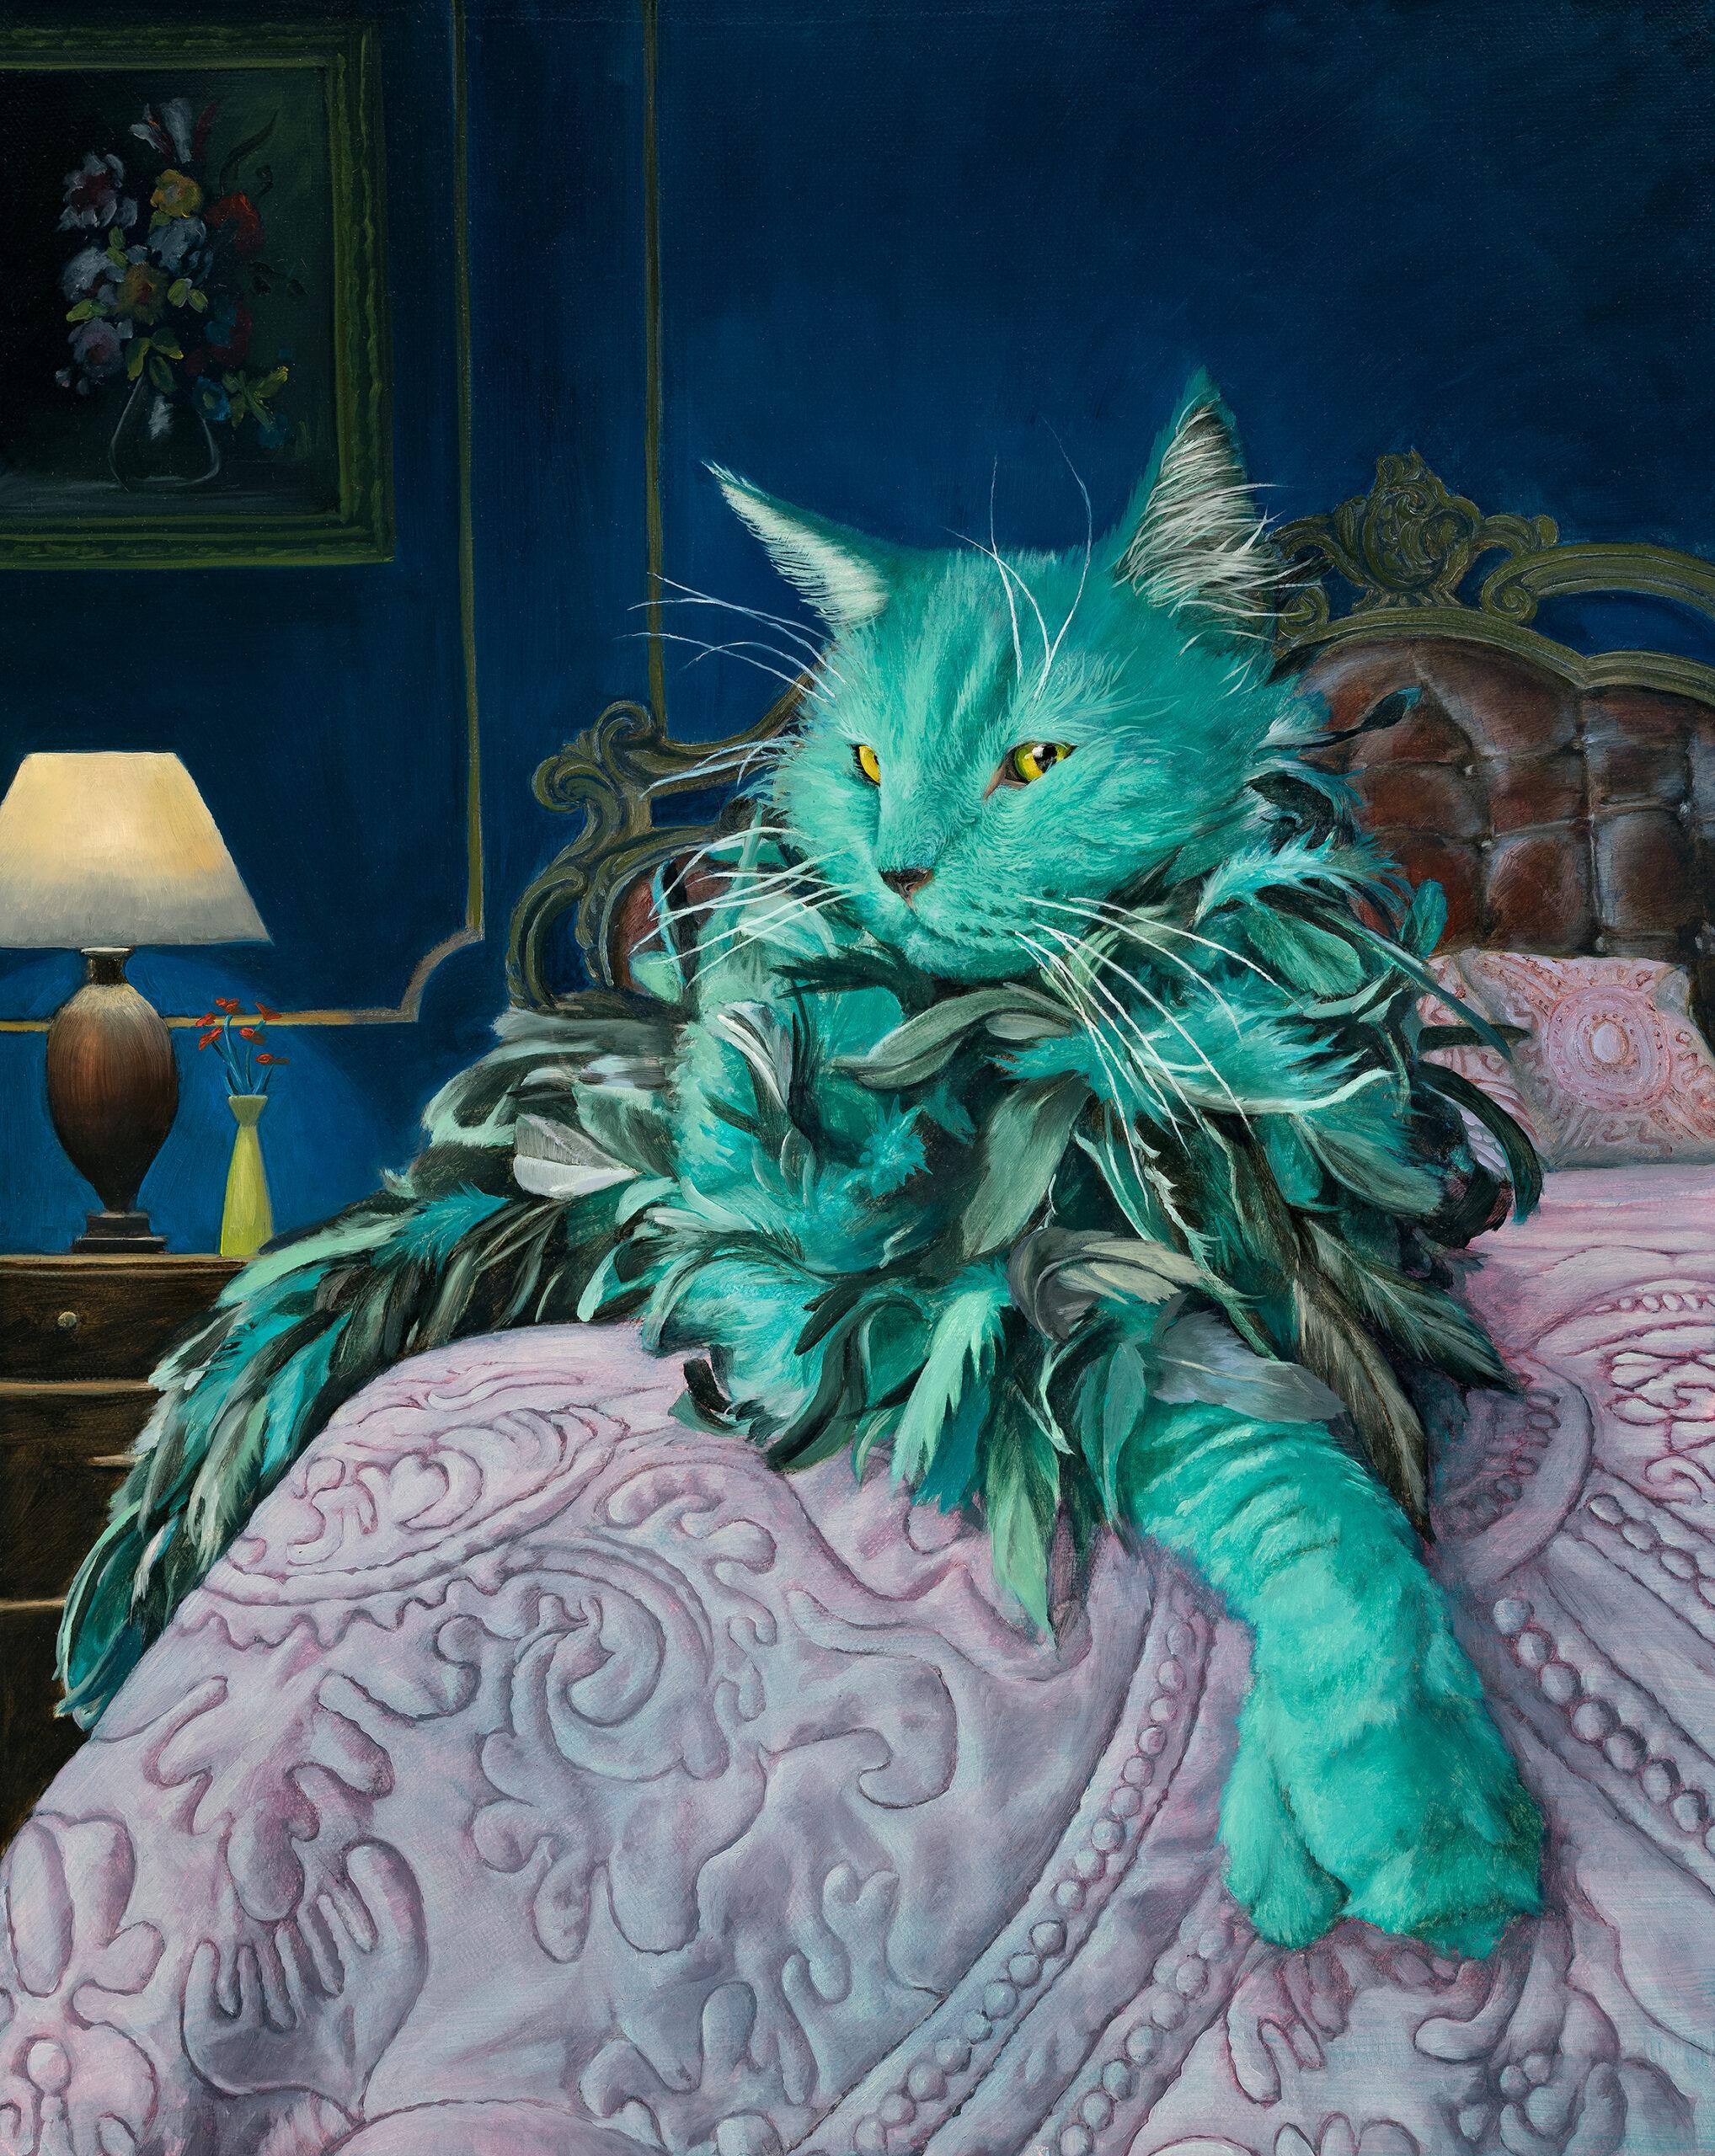 Purrrdy - Oil Painting by Leah Kiser